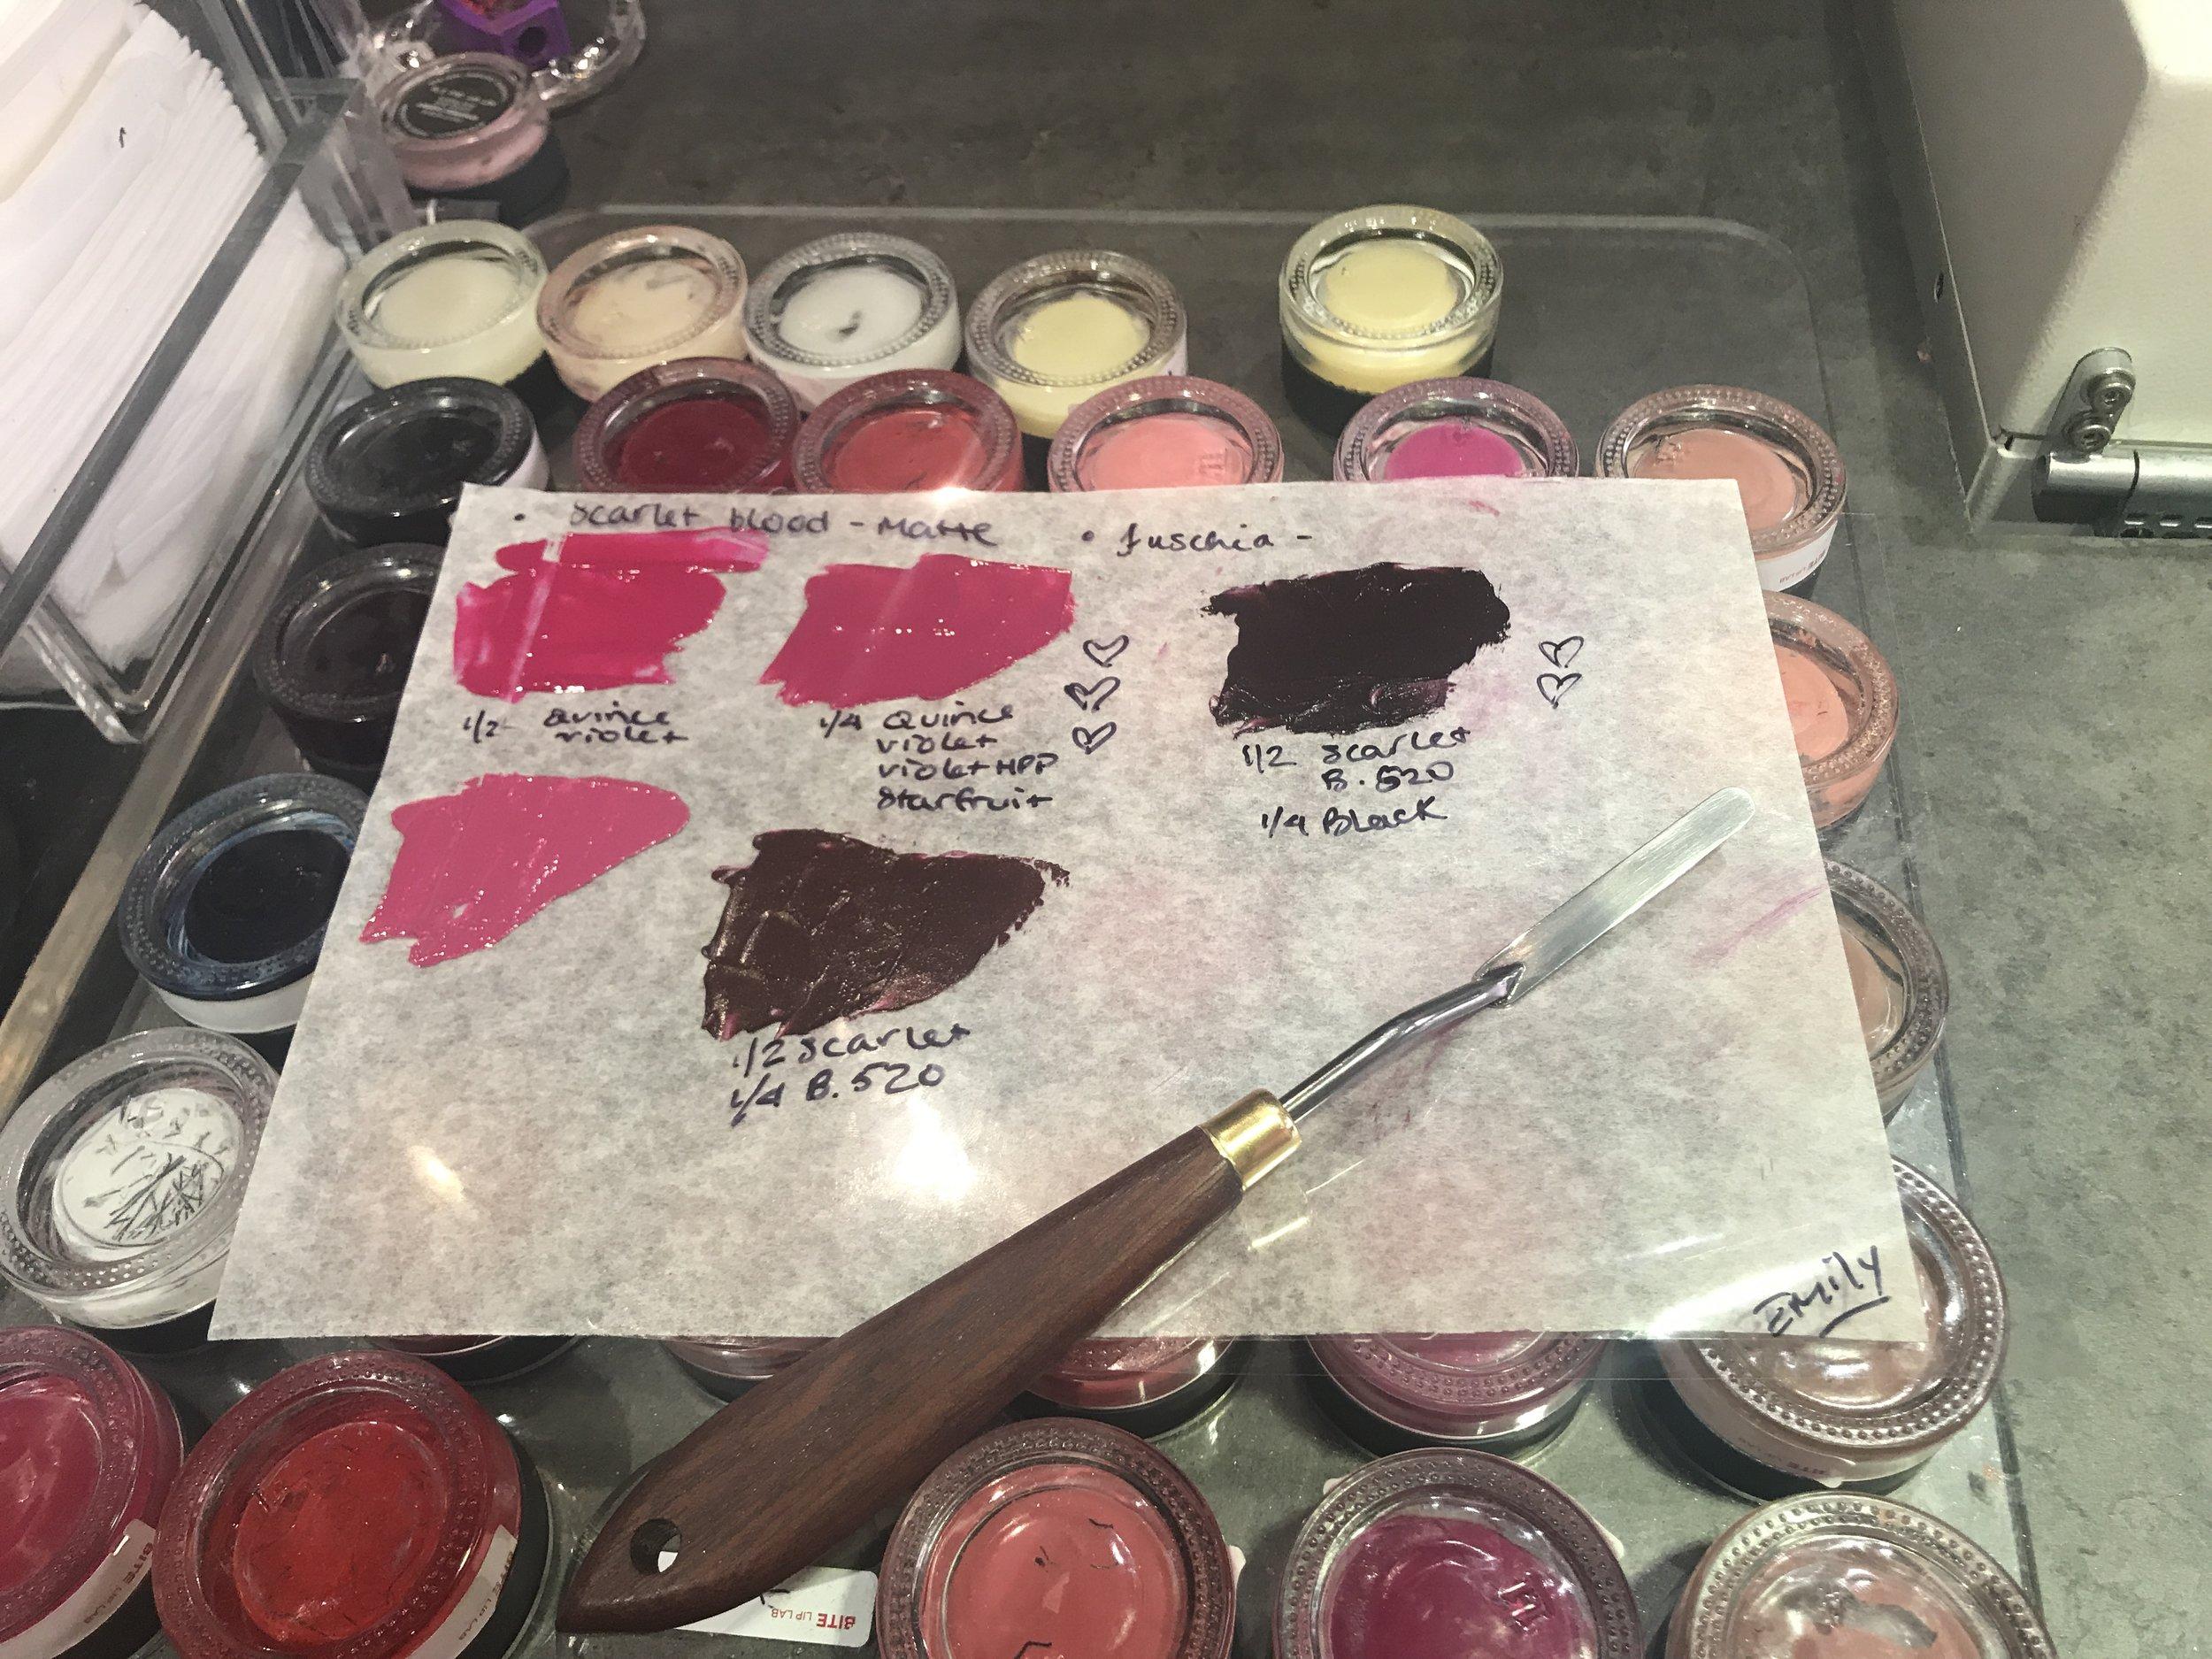 My Bespoke Lipsticks